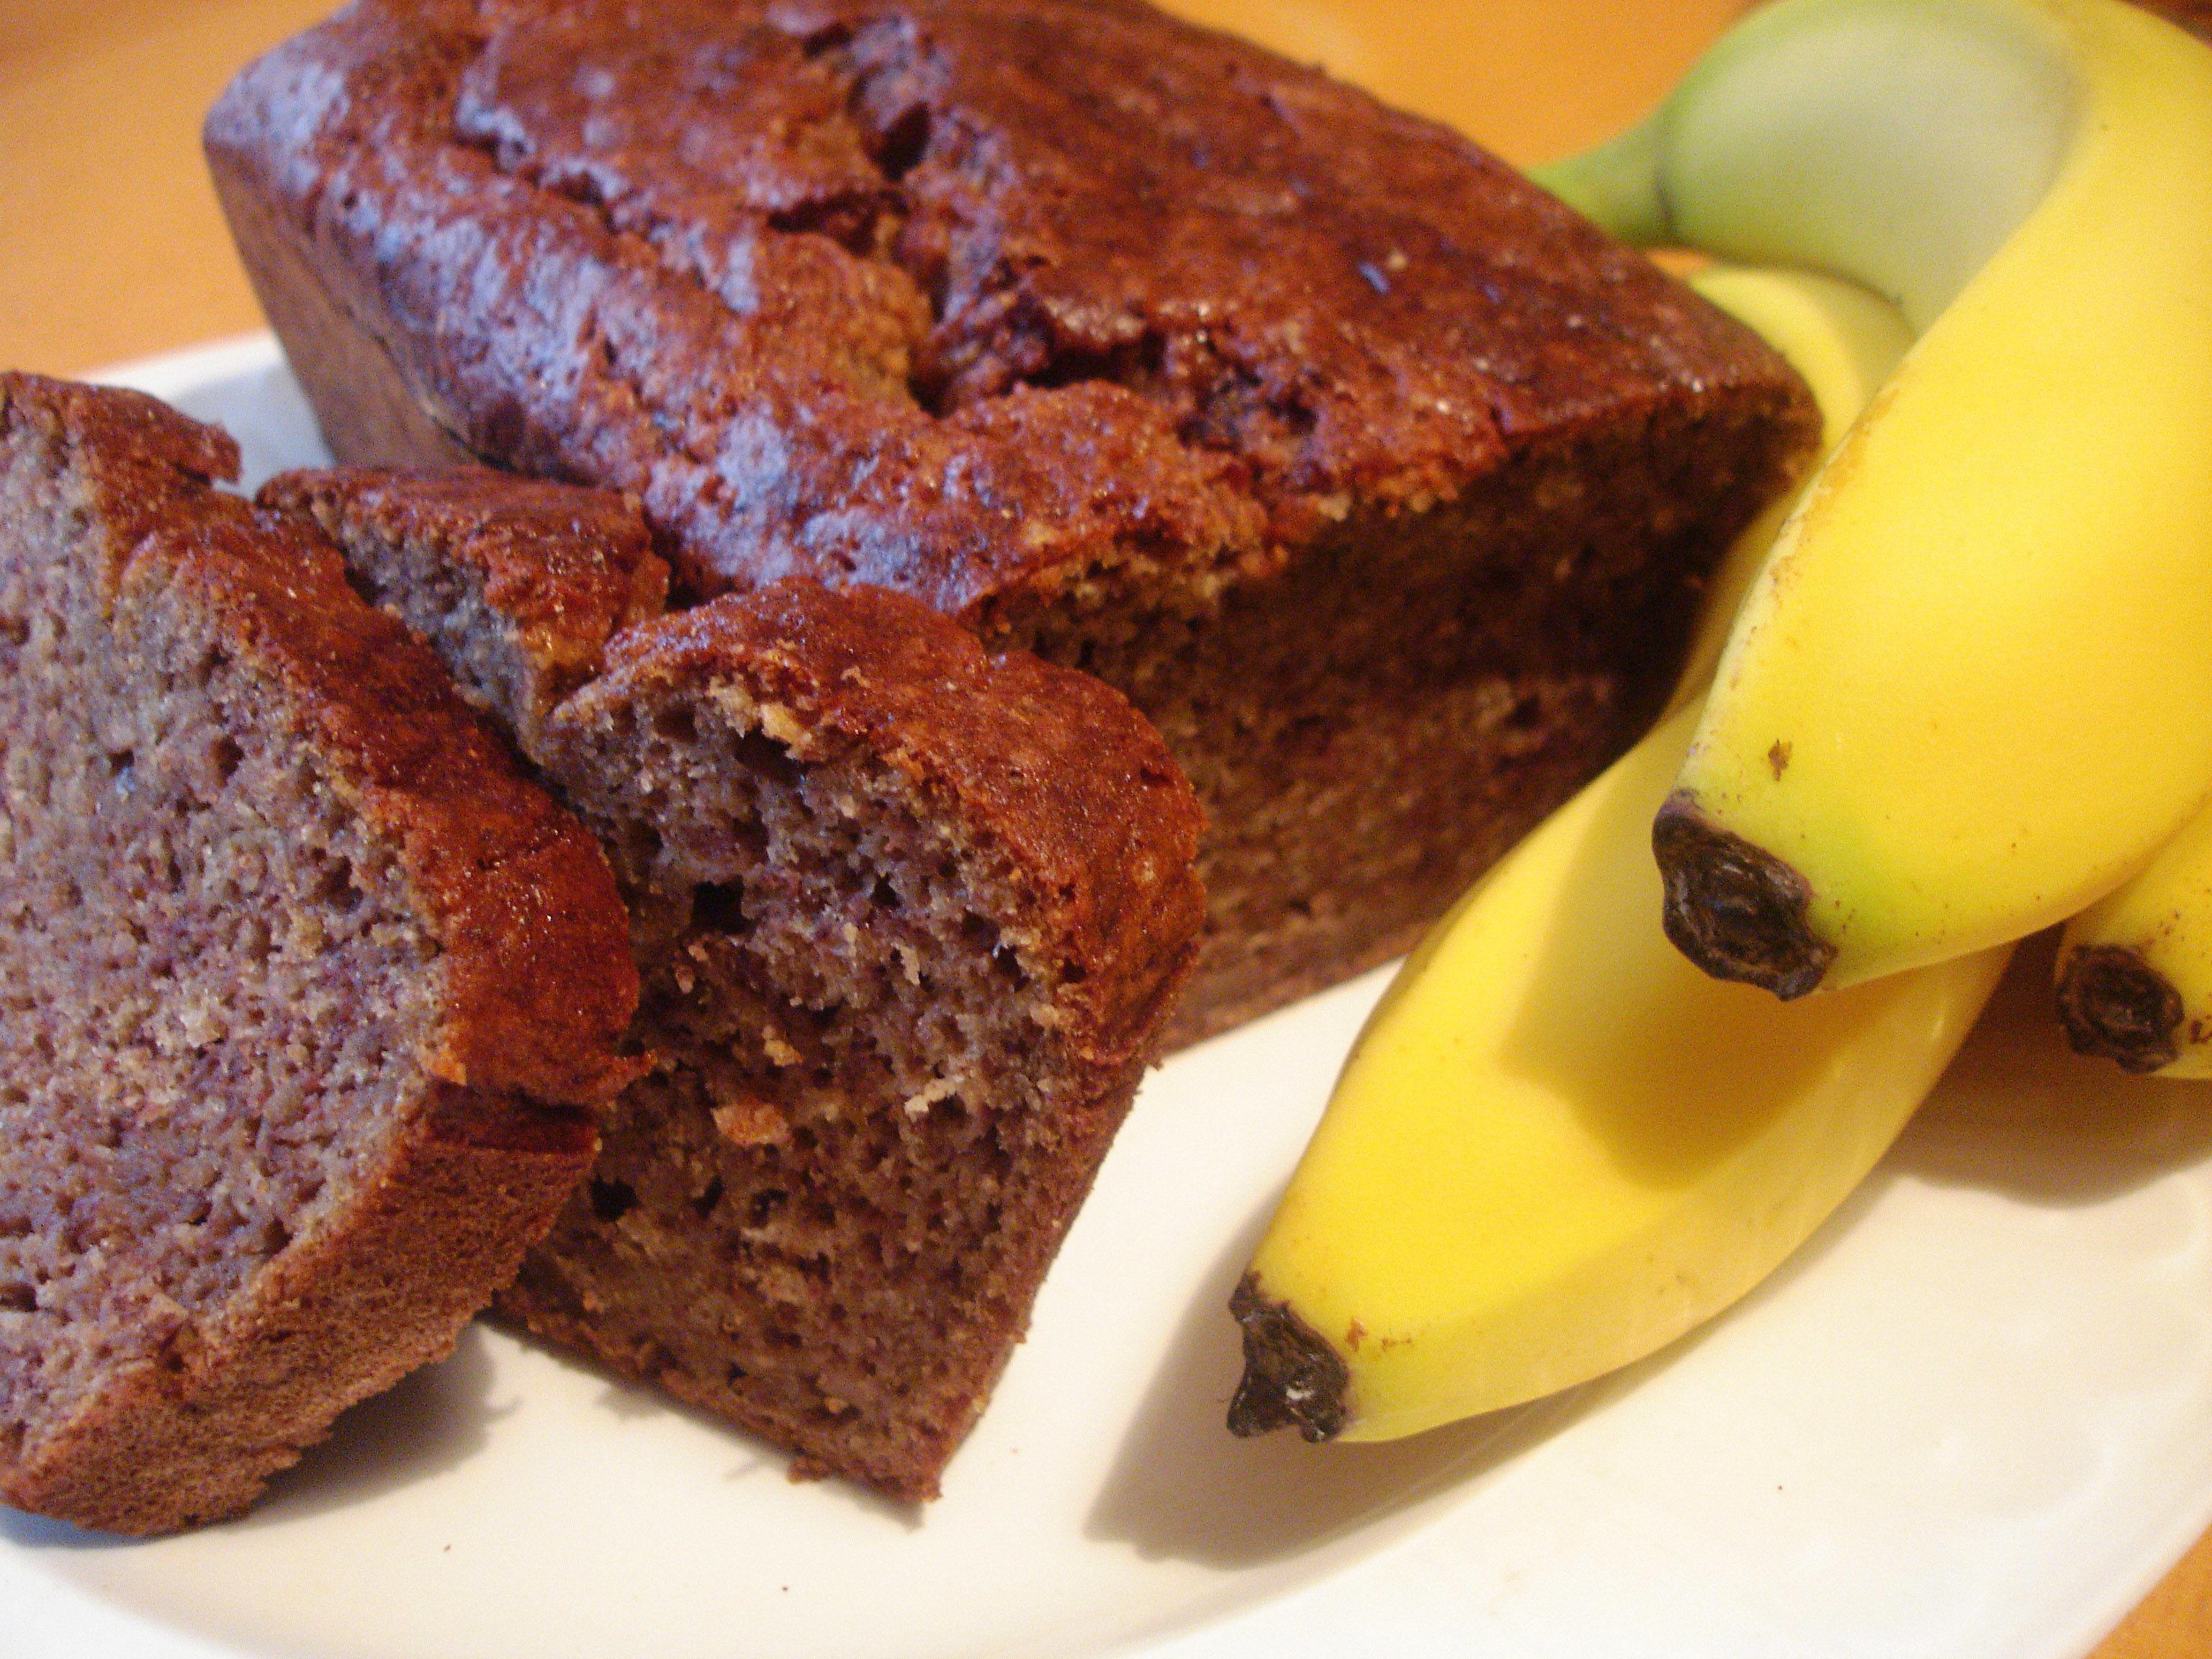 Low Fat Banana Bread  Low Fat Banana Bread recipe – All recipes Australia NZ